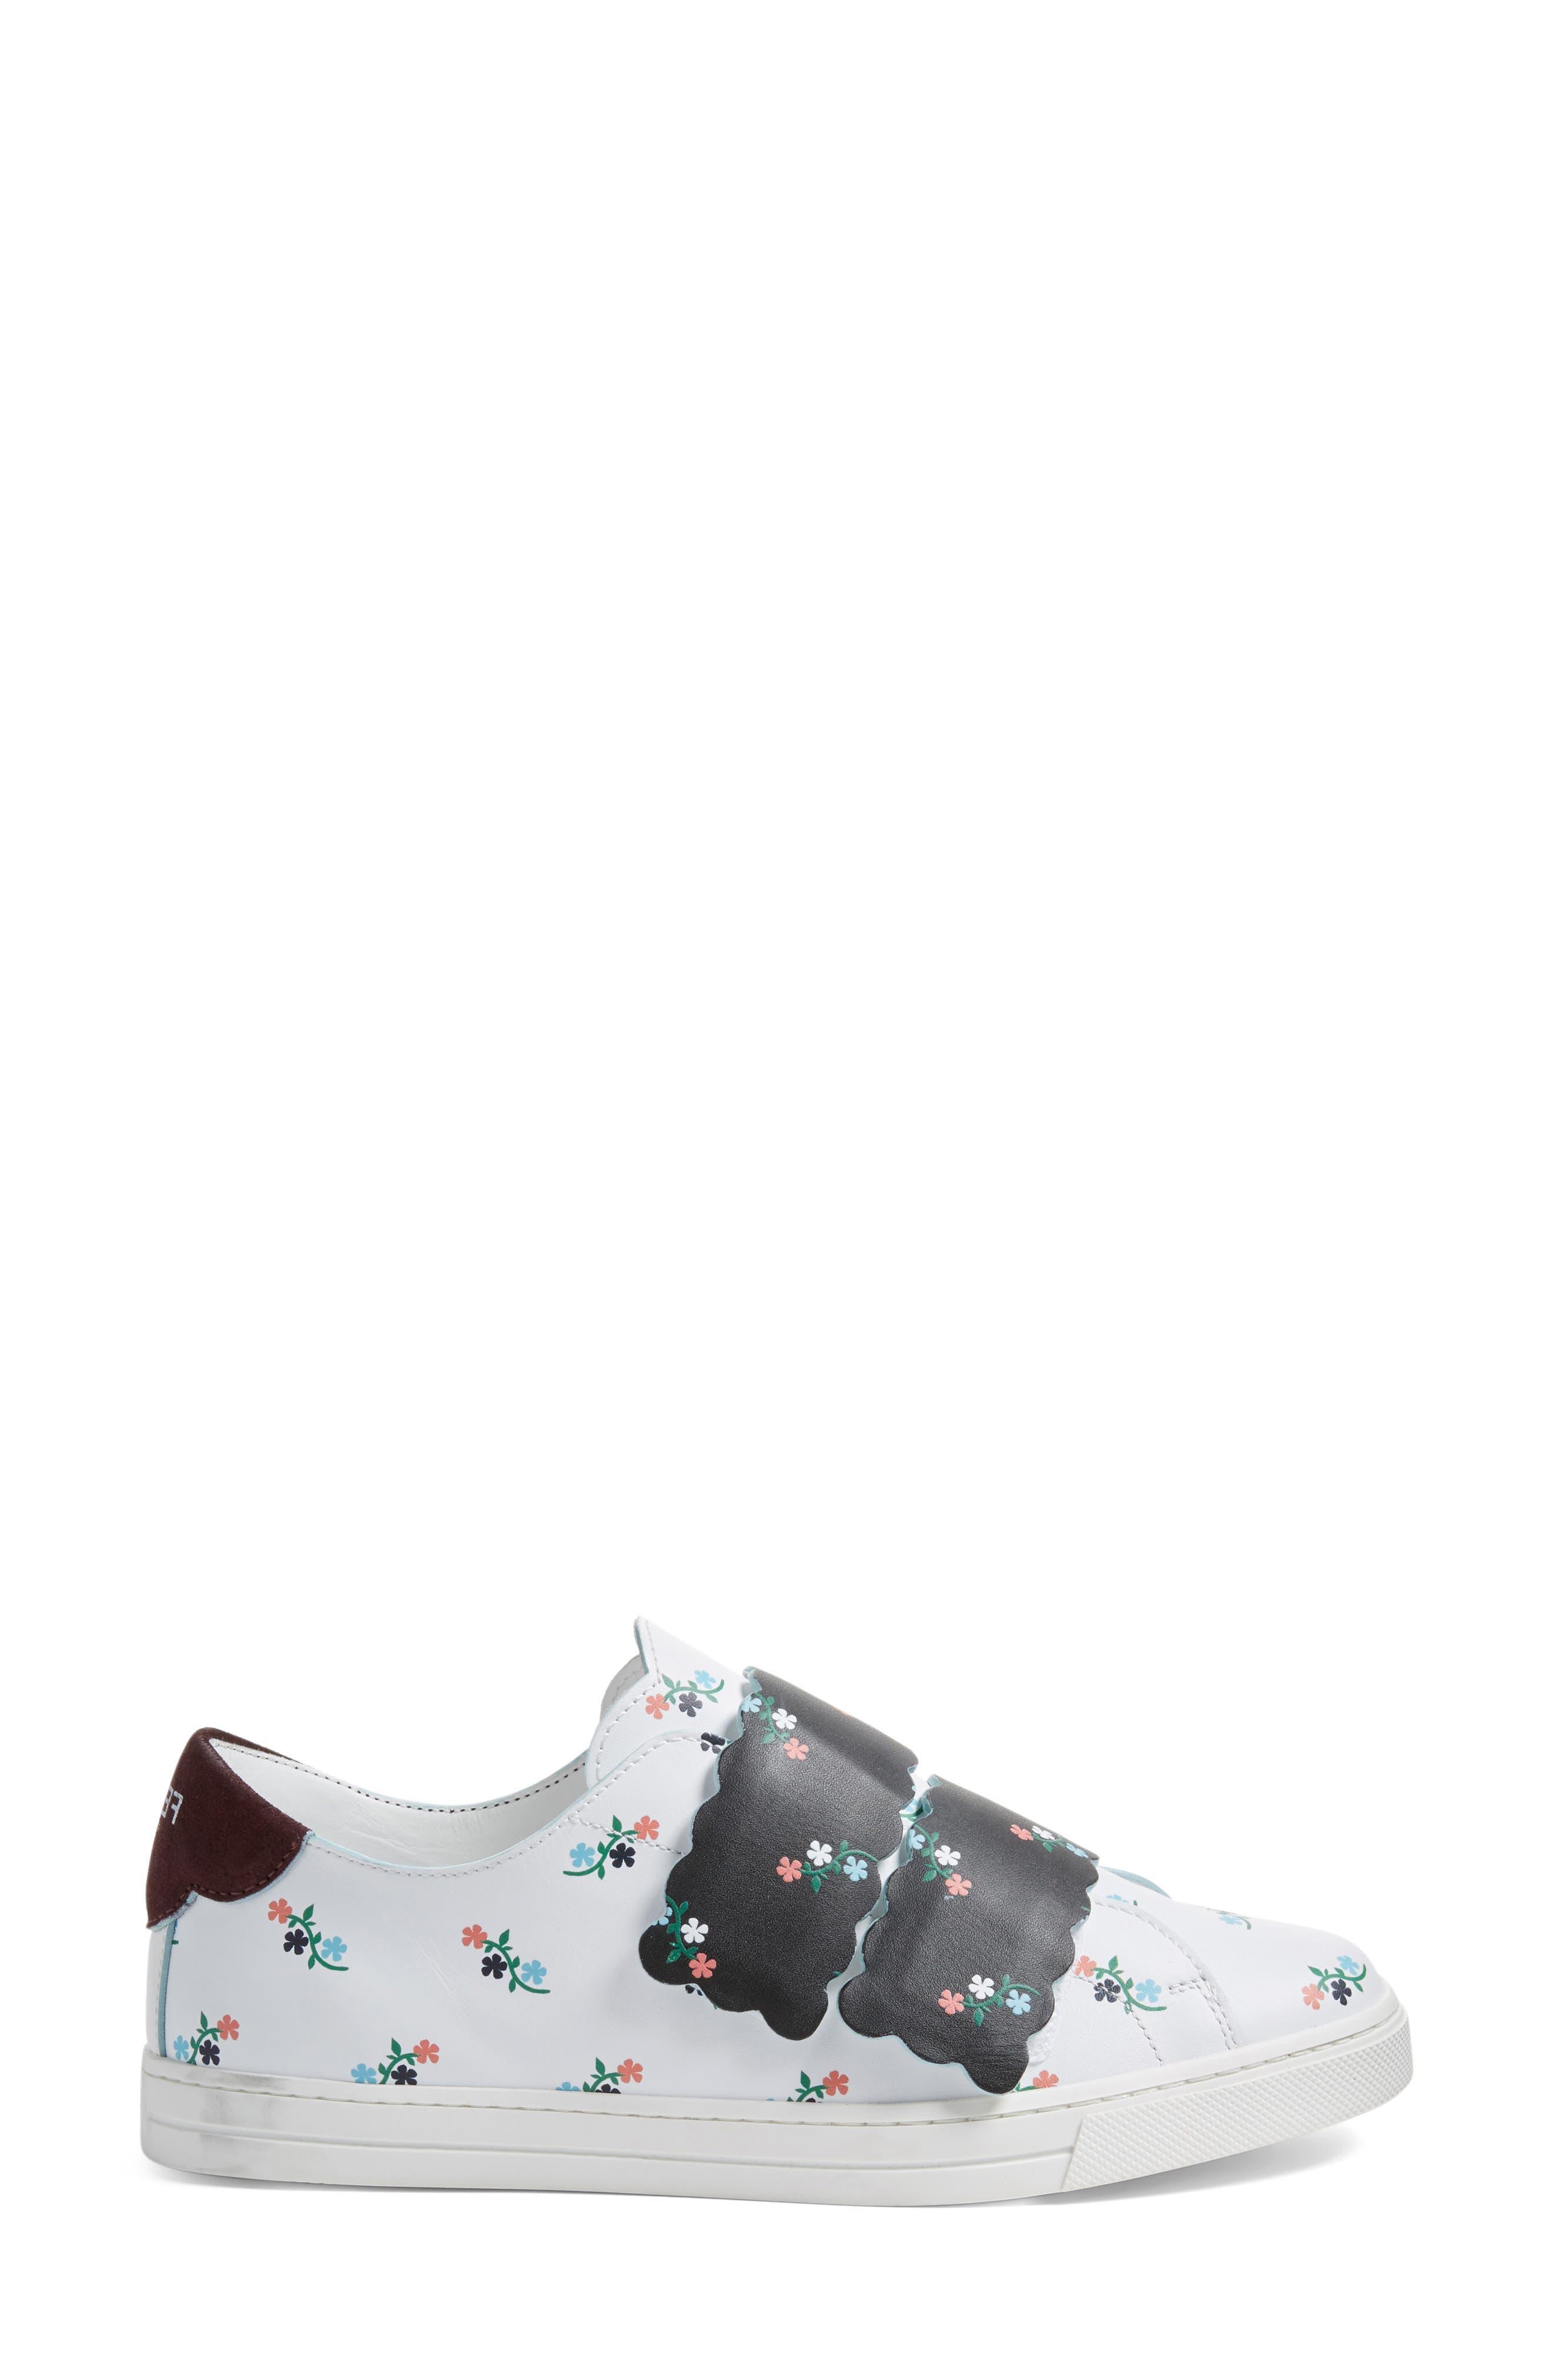 Scallop Sneaker,                             Alternate thumbnail 3, color,                             104